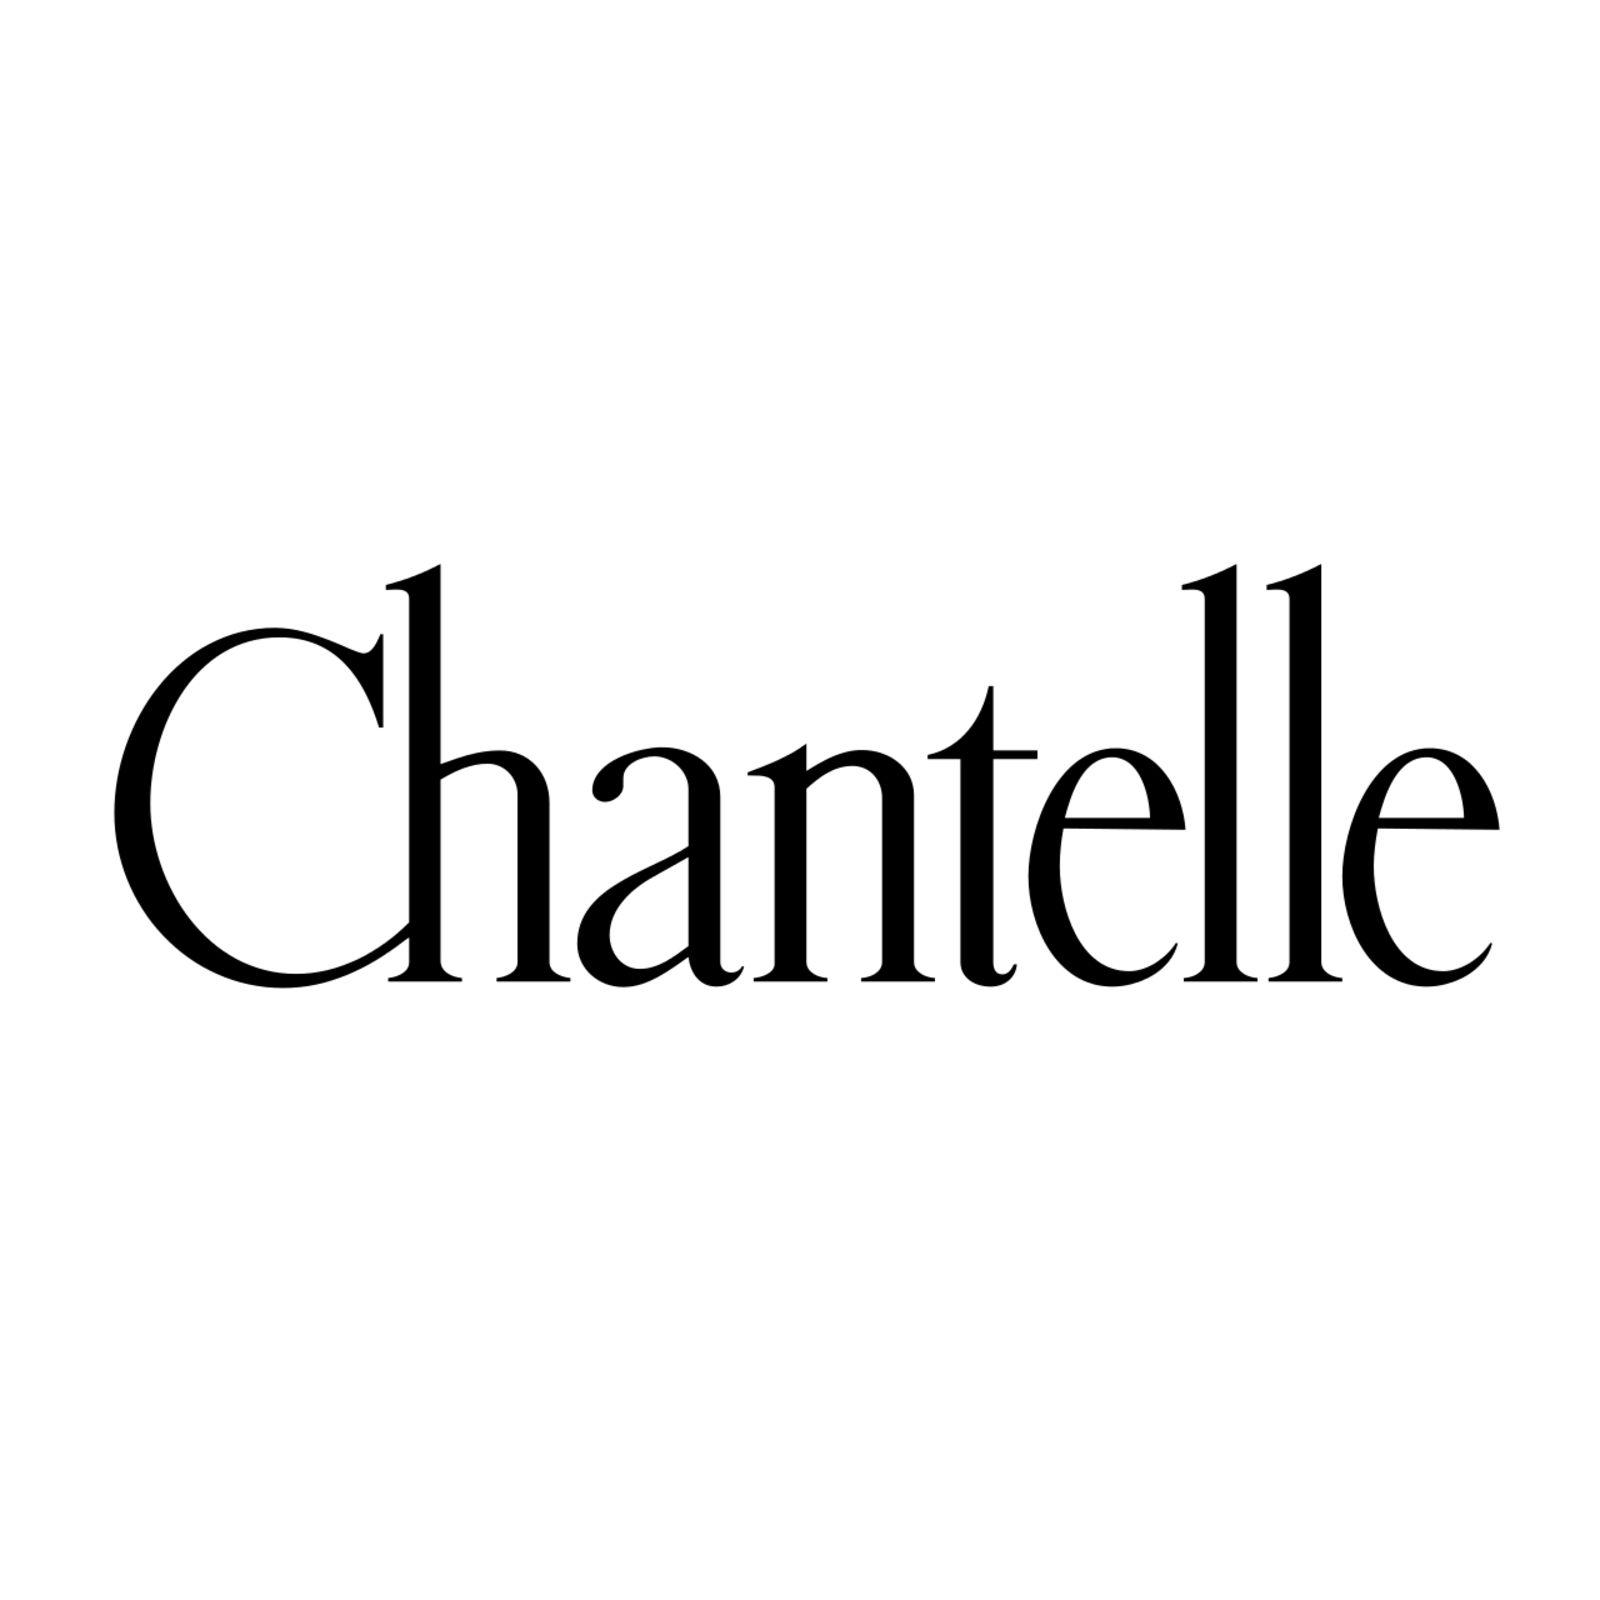 Chantelle (Image 1)